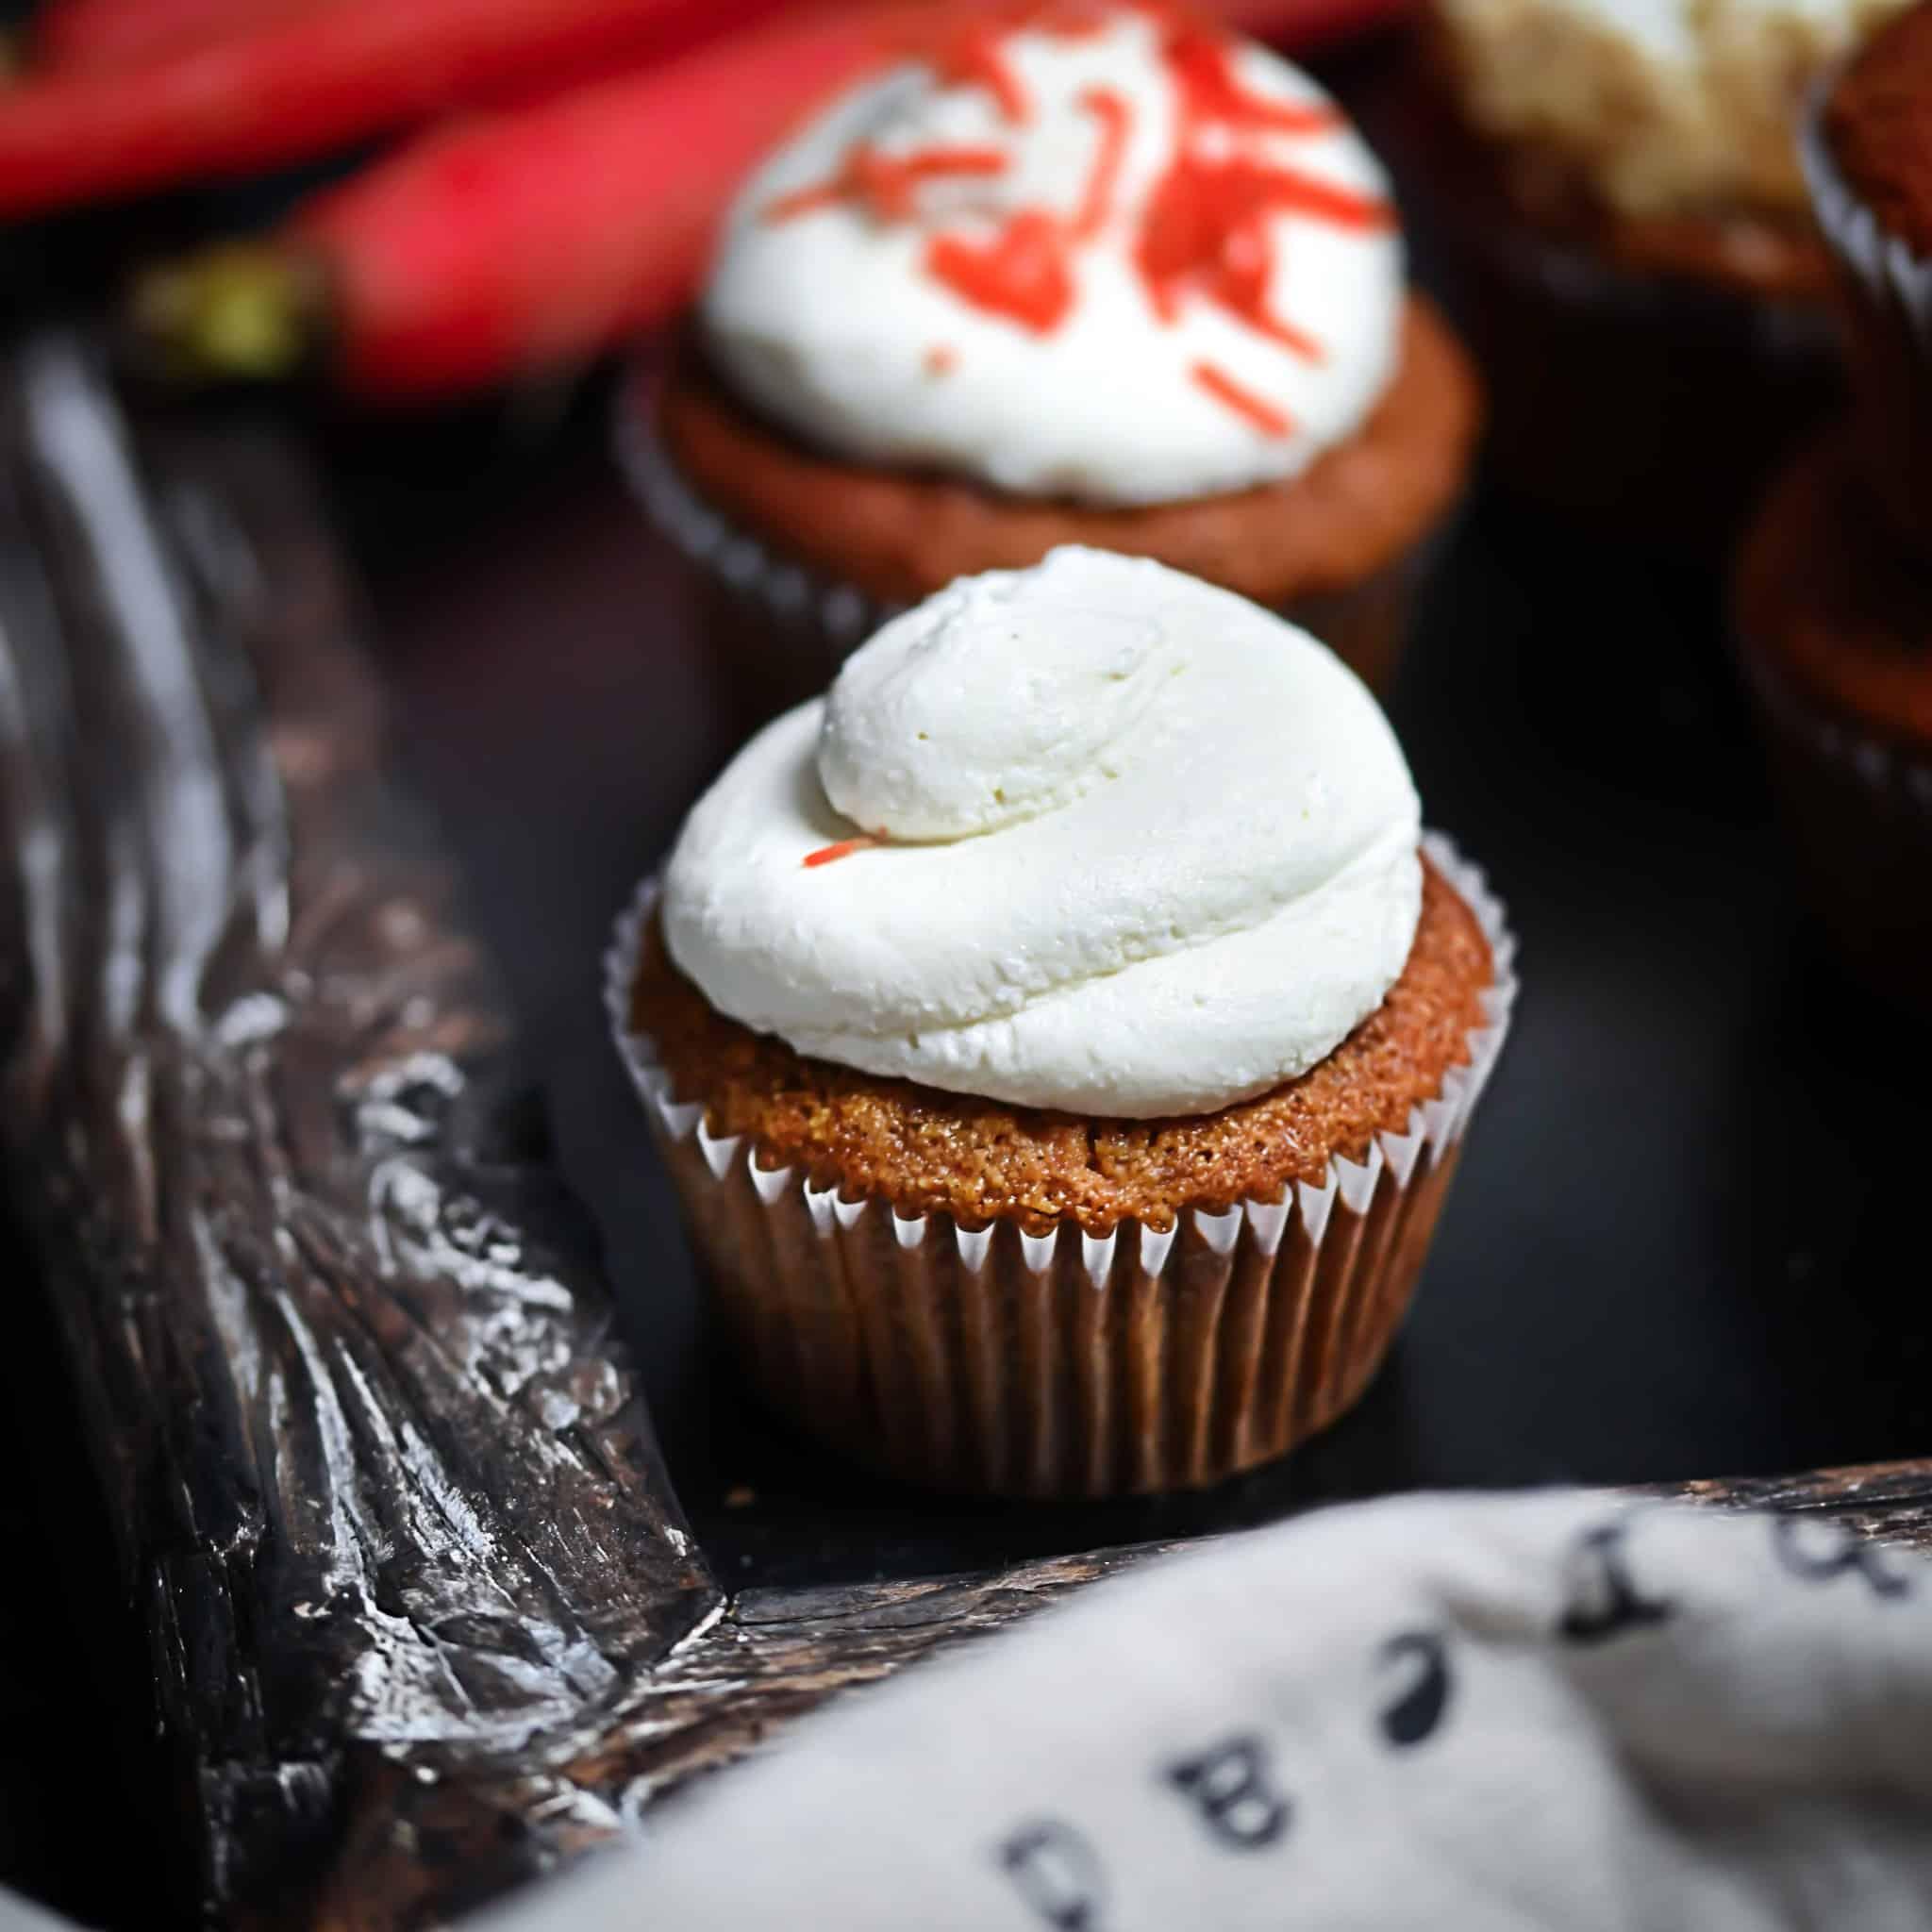 Easy Grain-Free Carrot Cupcakes on chalkboard